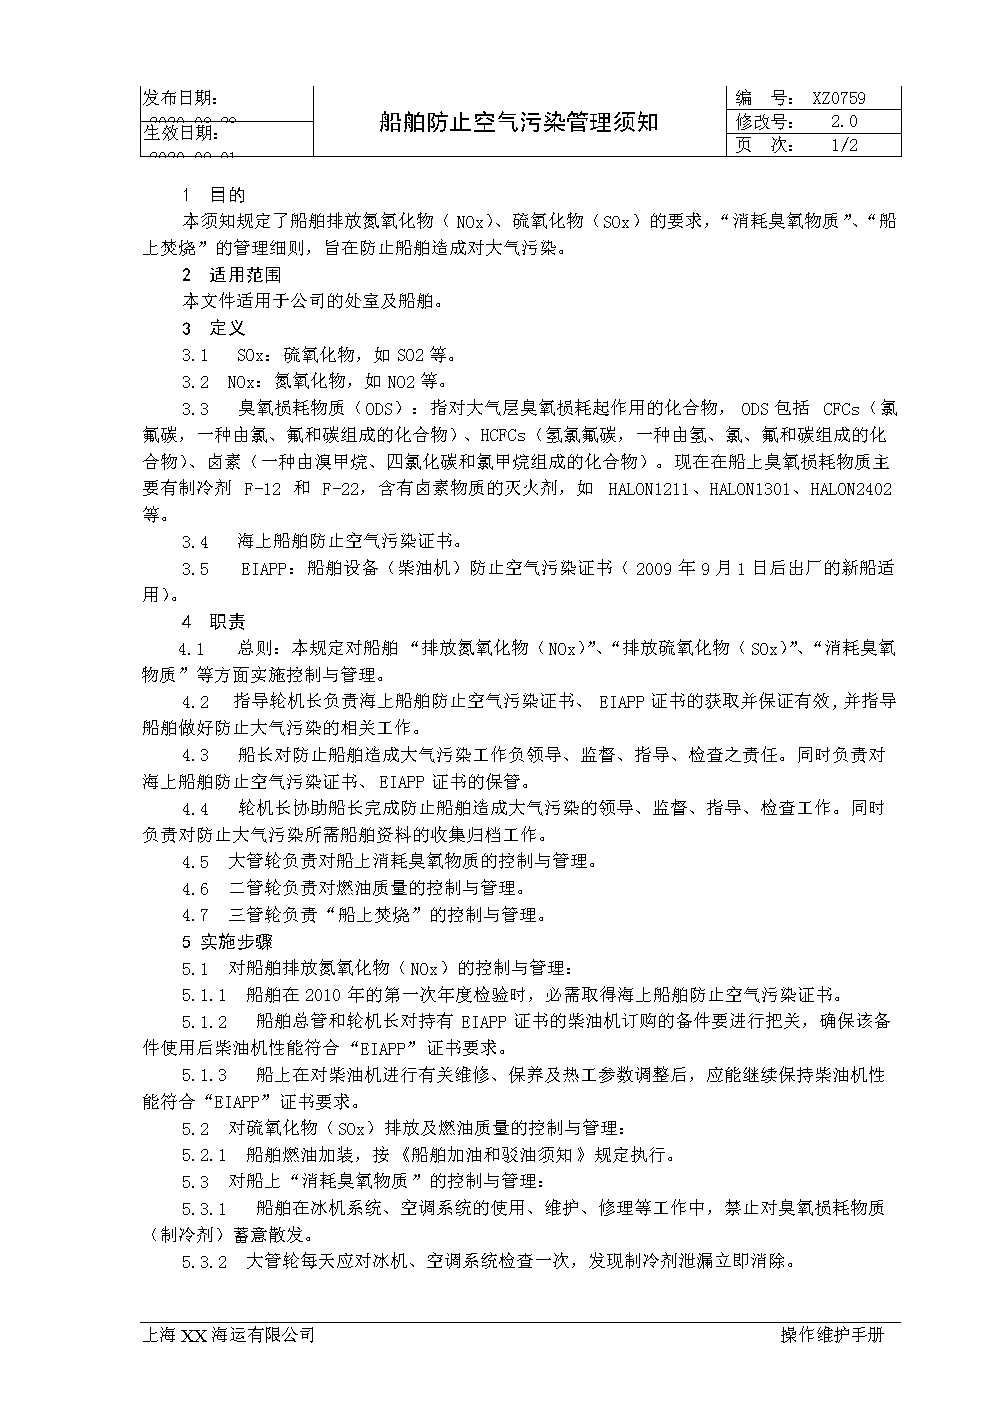 XX海運有限公司XX海運有限公司船舶防止空氣污染管理須知.doc